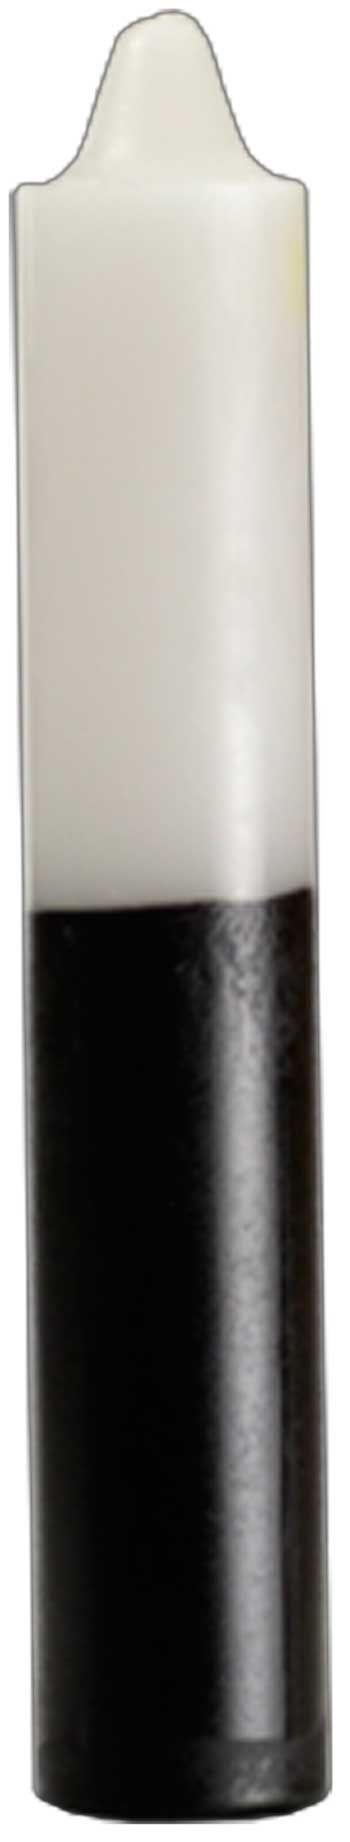 "9"" White/ Black Pillar Candle"